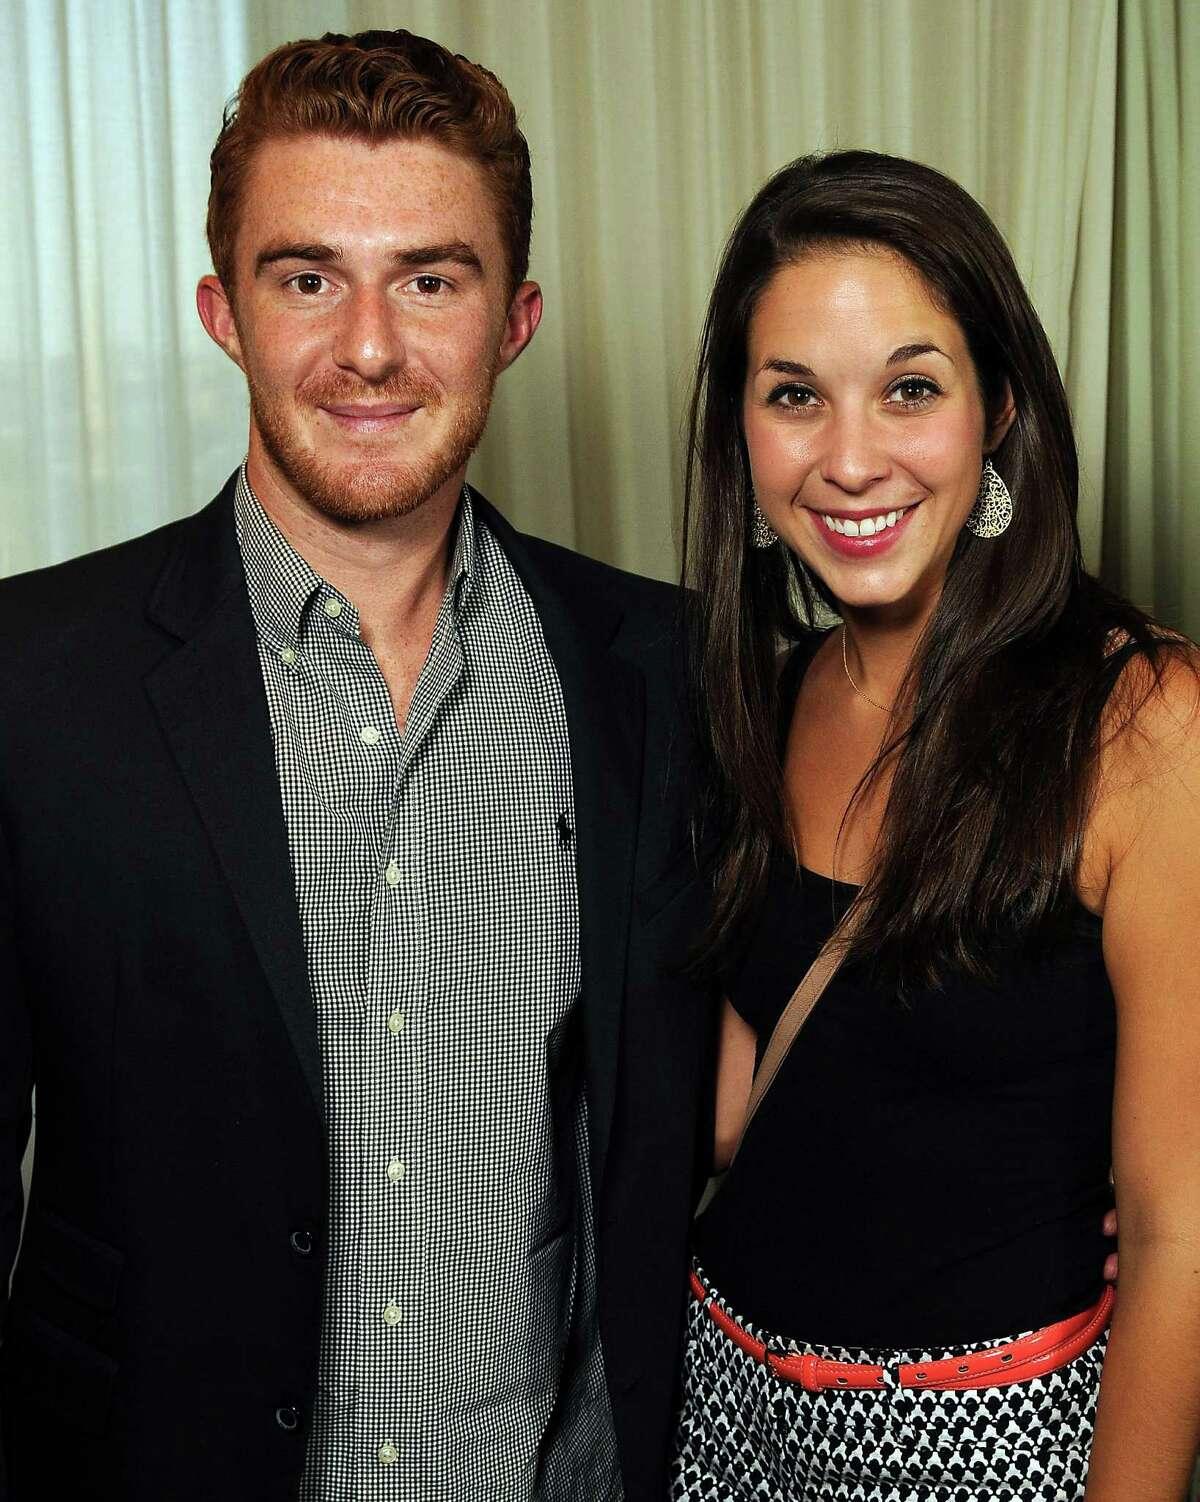 Eric Frankum and Emily Maddox